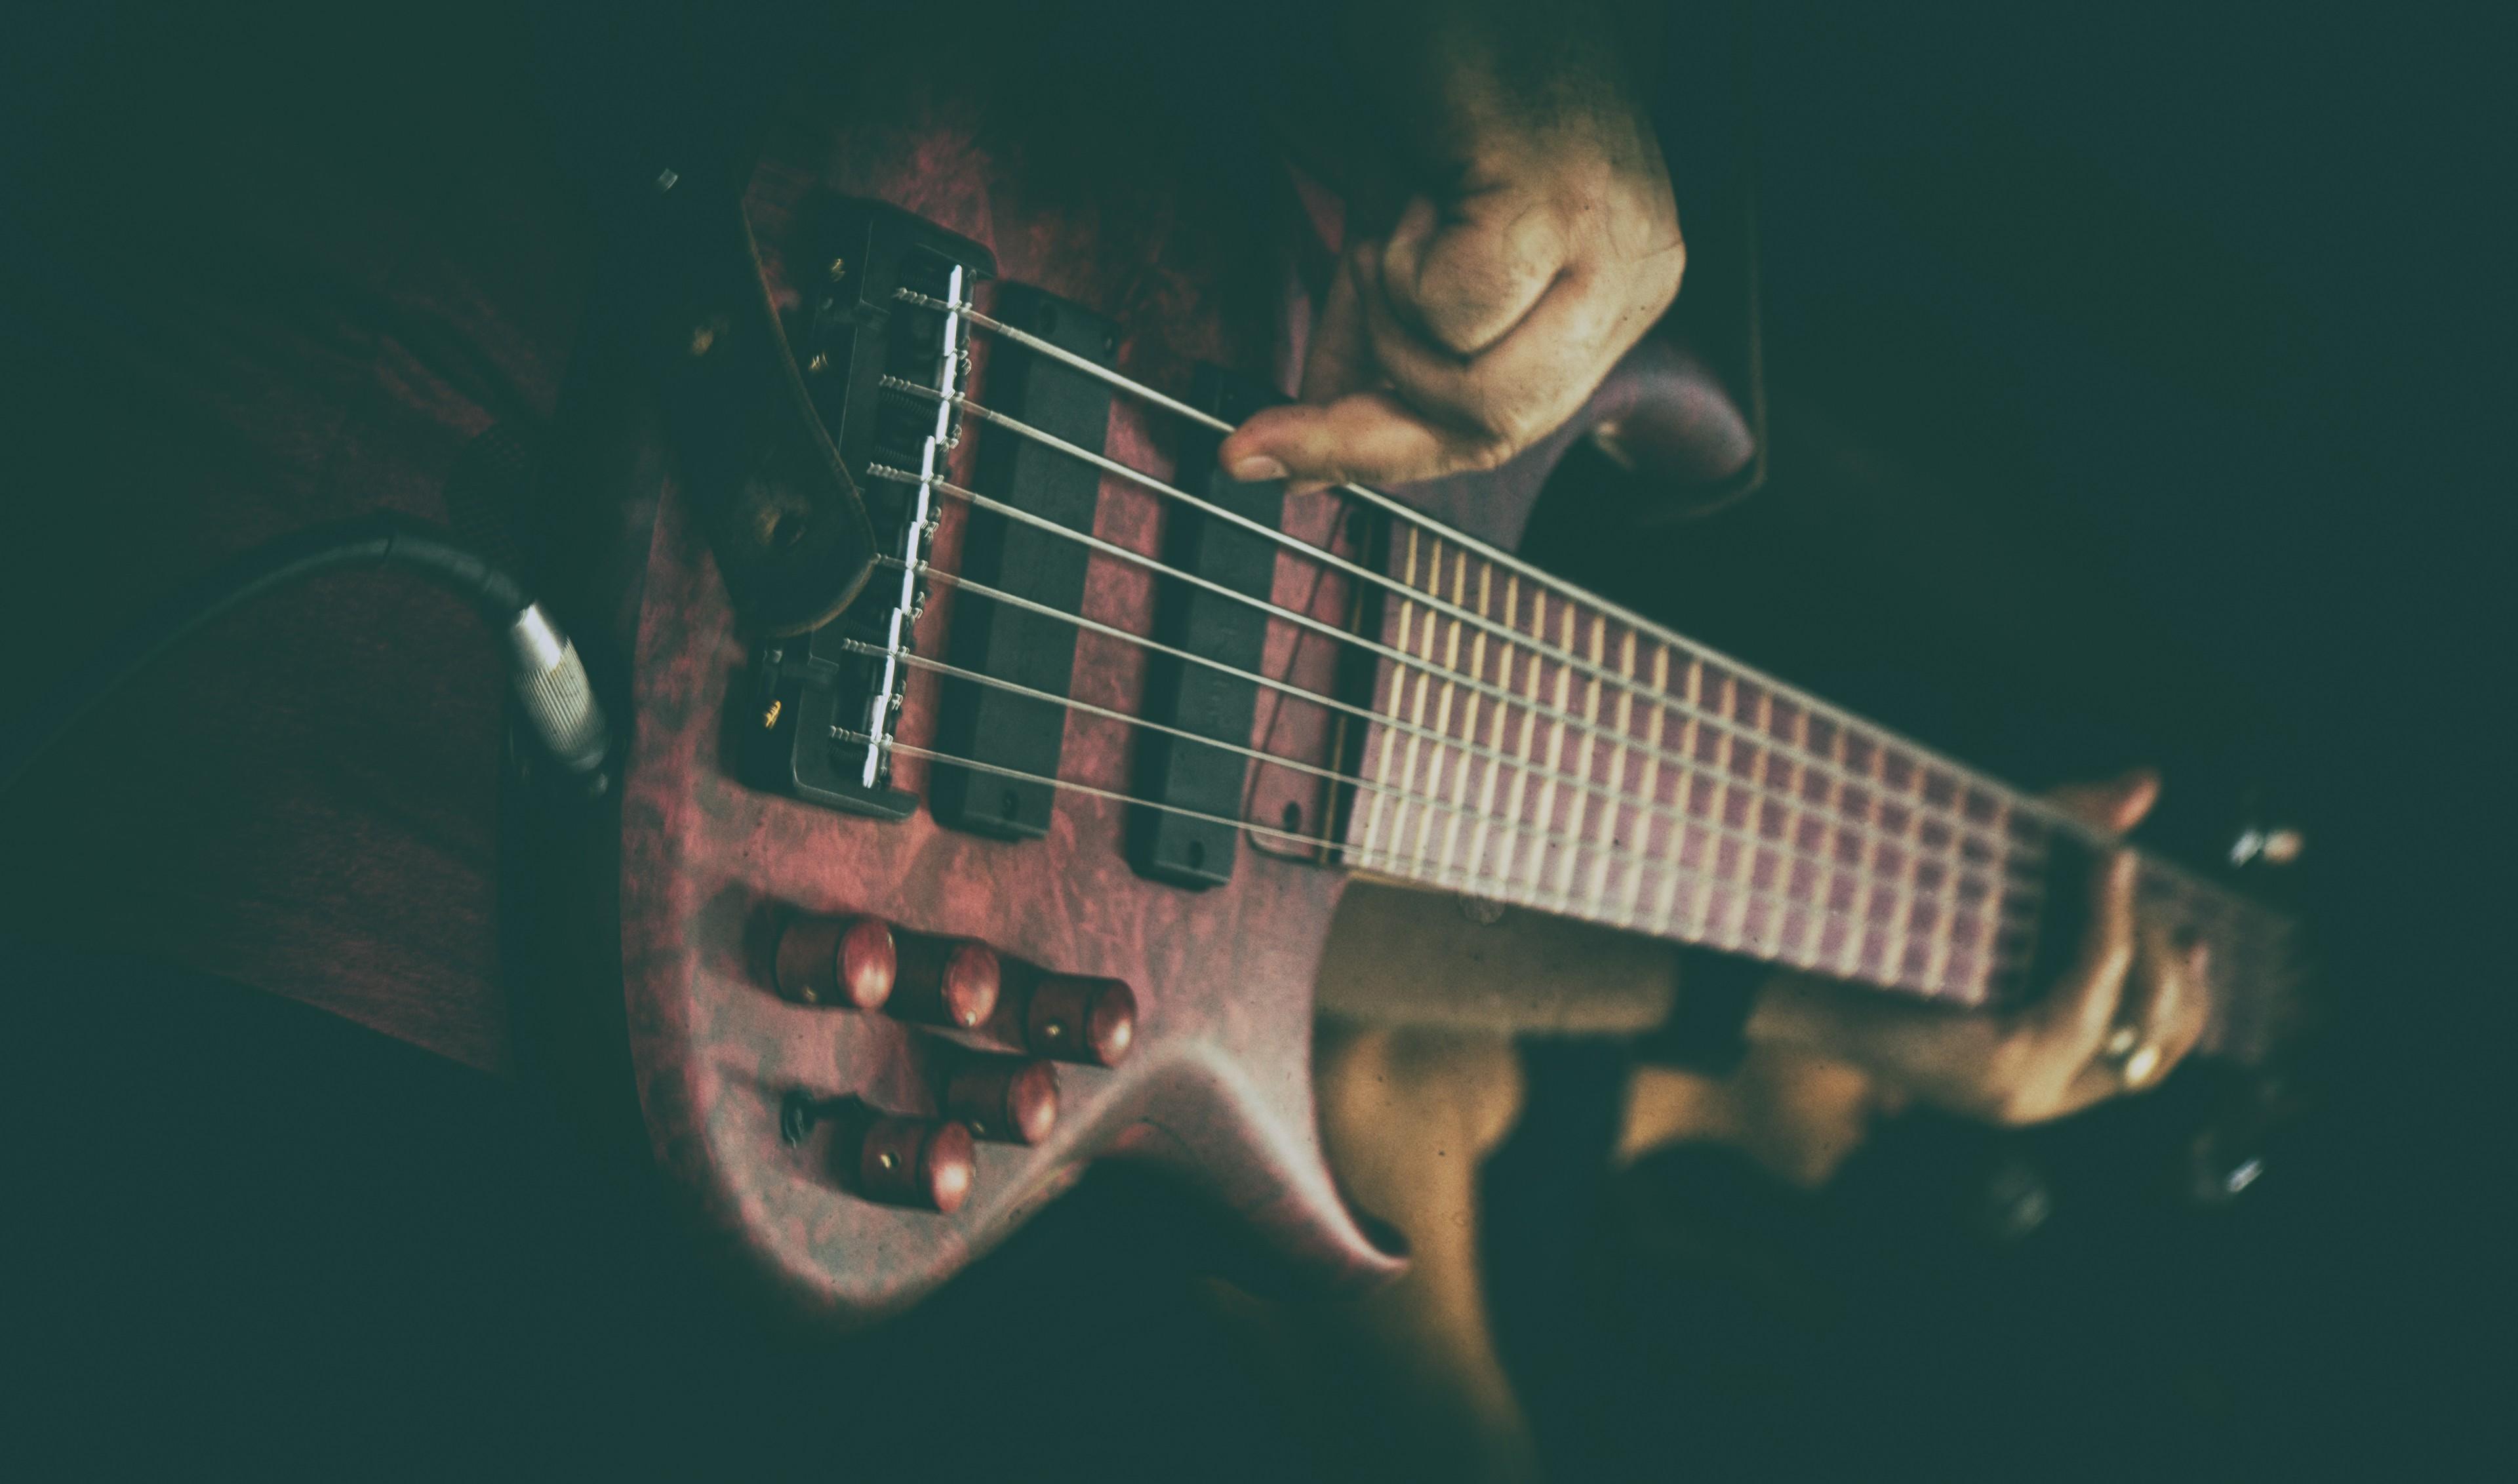 Wonderful Wallpaper Music Bass - guitar-musical-instrument-photography-music-guitarist-bass-guitars-close-up-plucked-string-instruments-string-instrument-bassist-bass-guitar-acoustic-guitar-slide-guitar-38396  Snapshot_31770.jpg